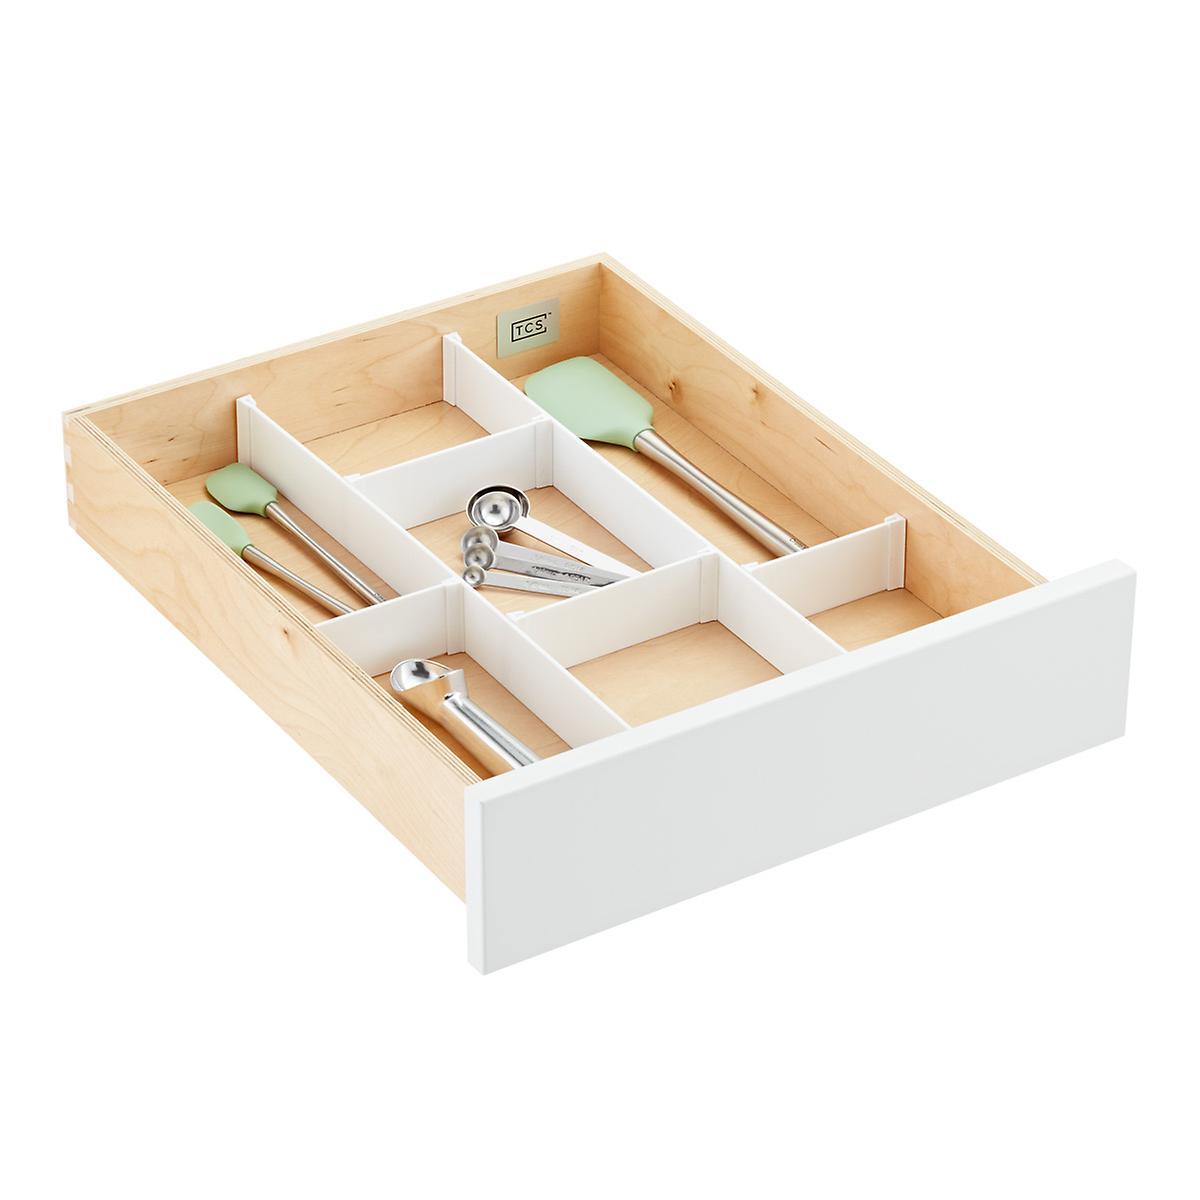 447010g-custom-drawer-organizer-stri.jpg